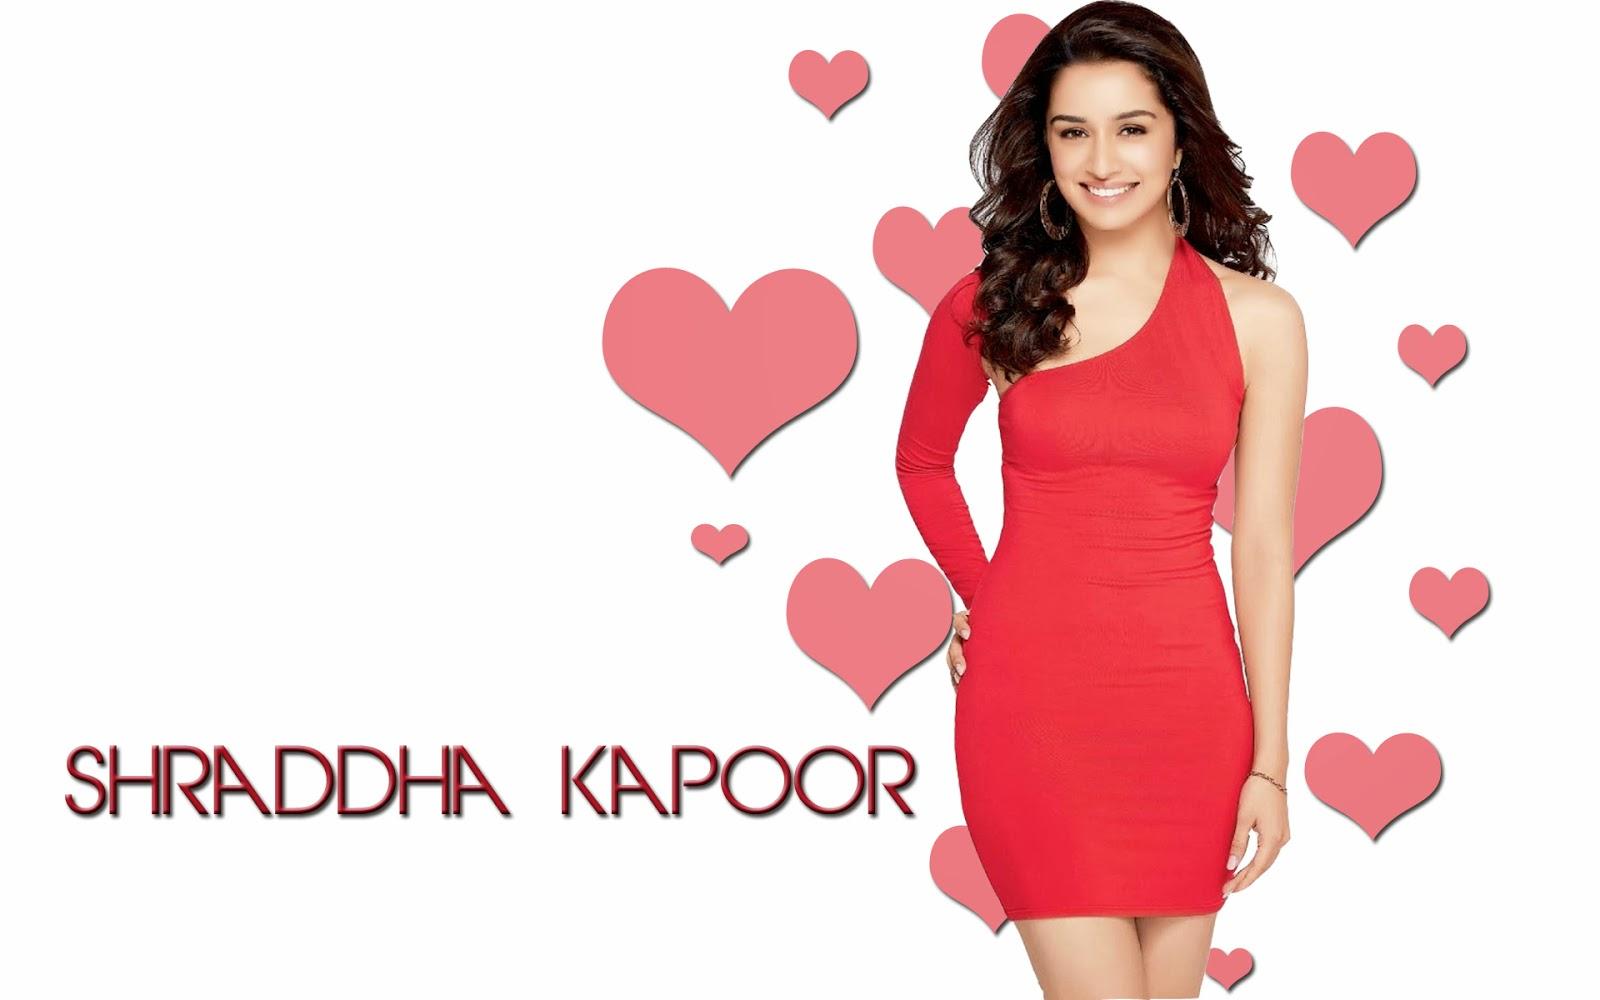 Shraddha Kapoor HD Wallpaper